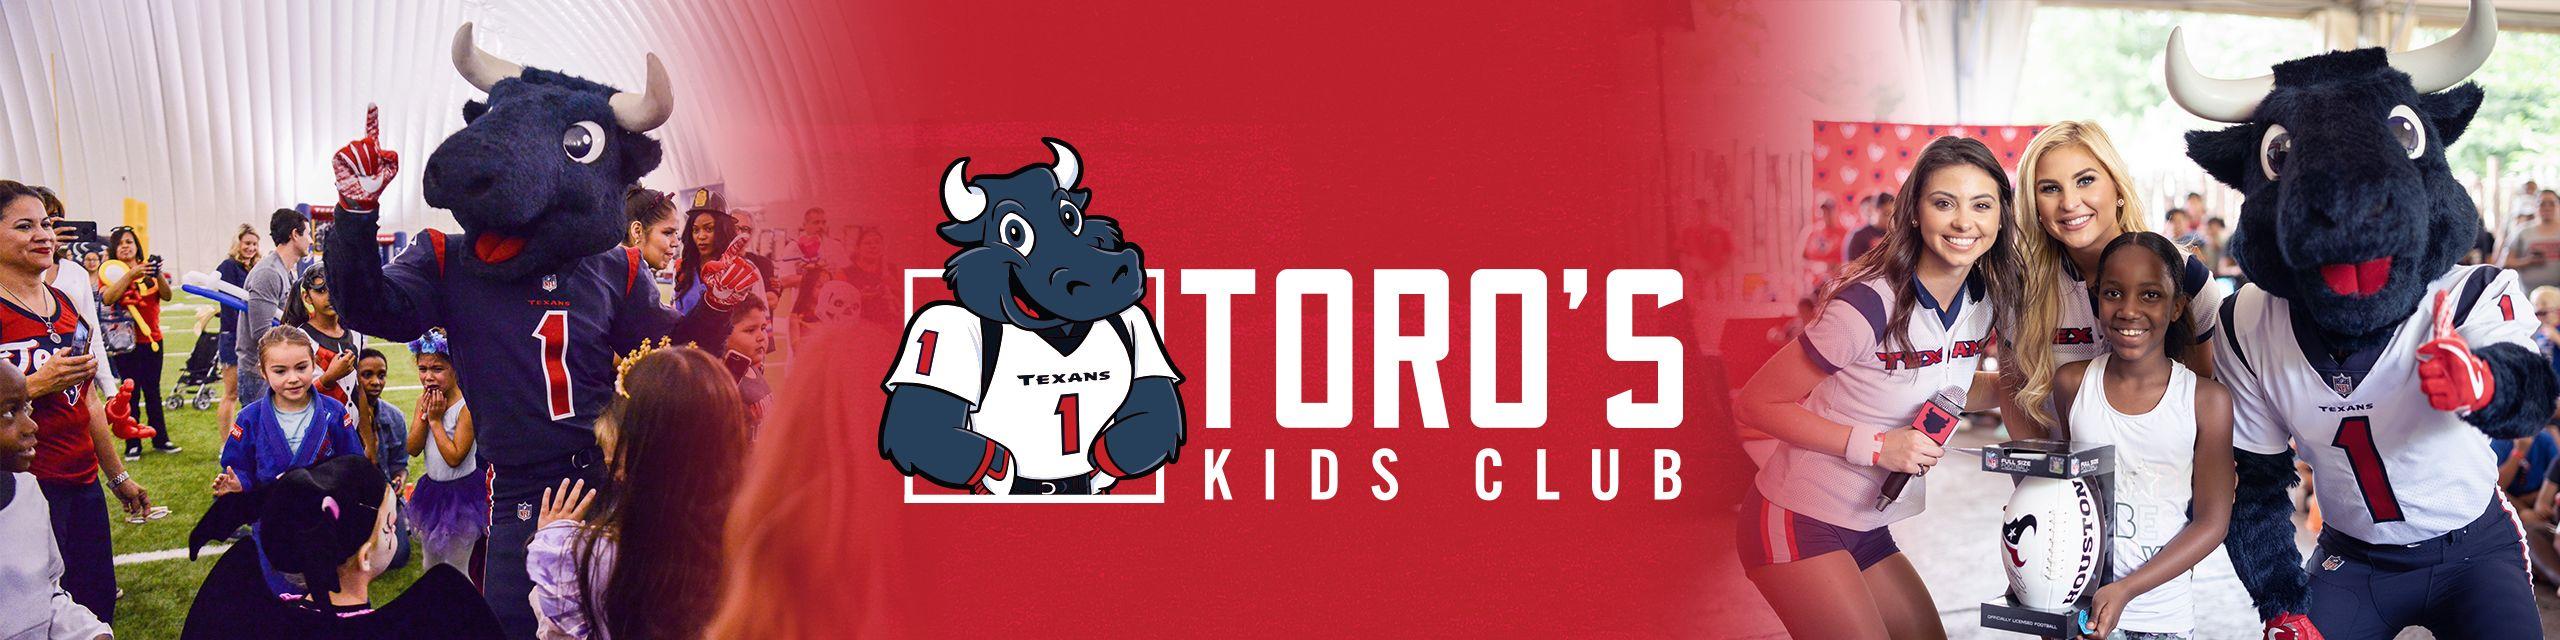 TORO's Kids Club